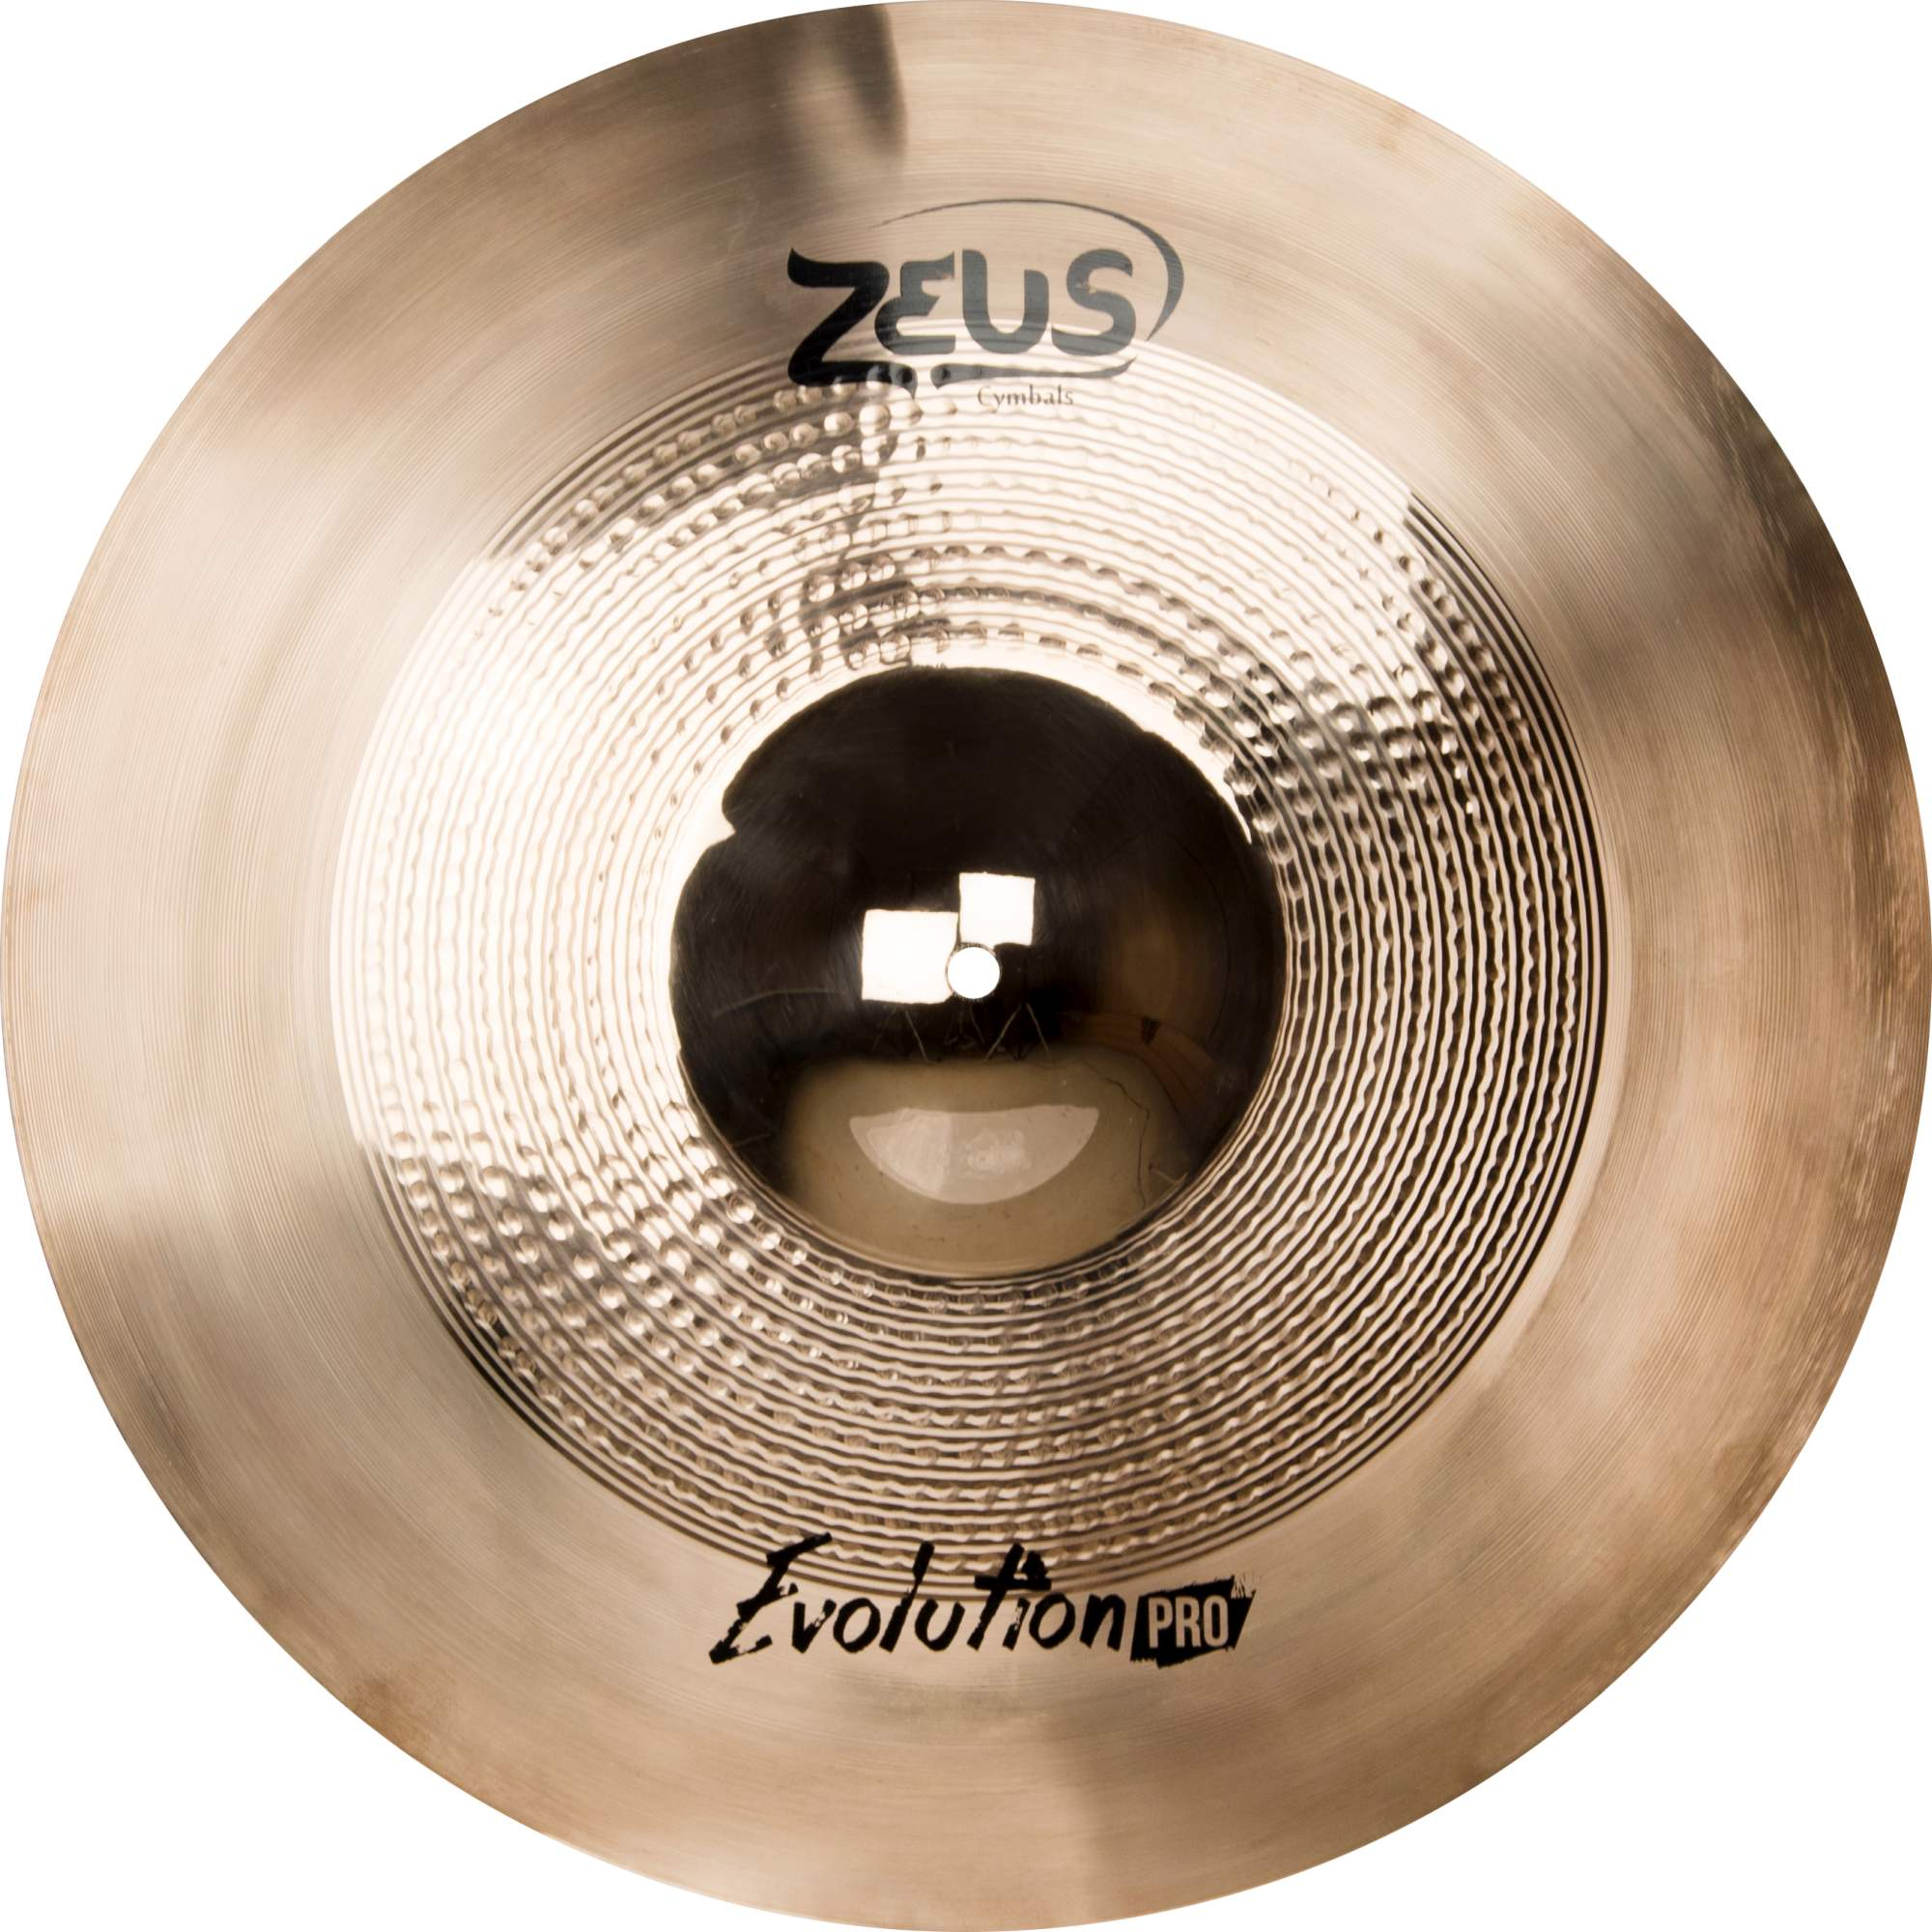 Prato Zeus Evolution Pro Ride 20 Zepr20